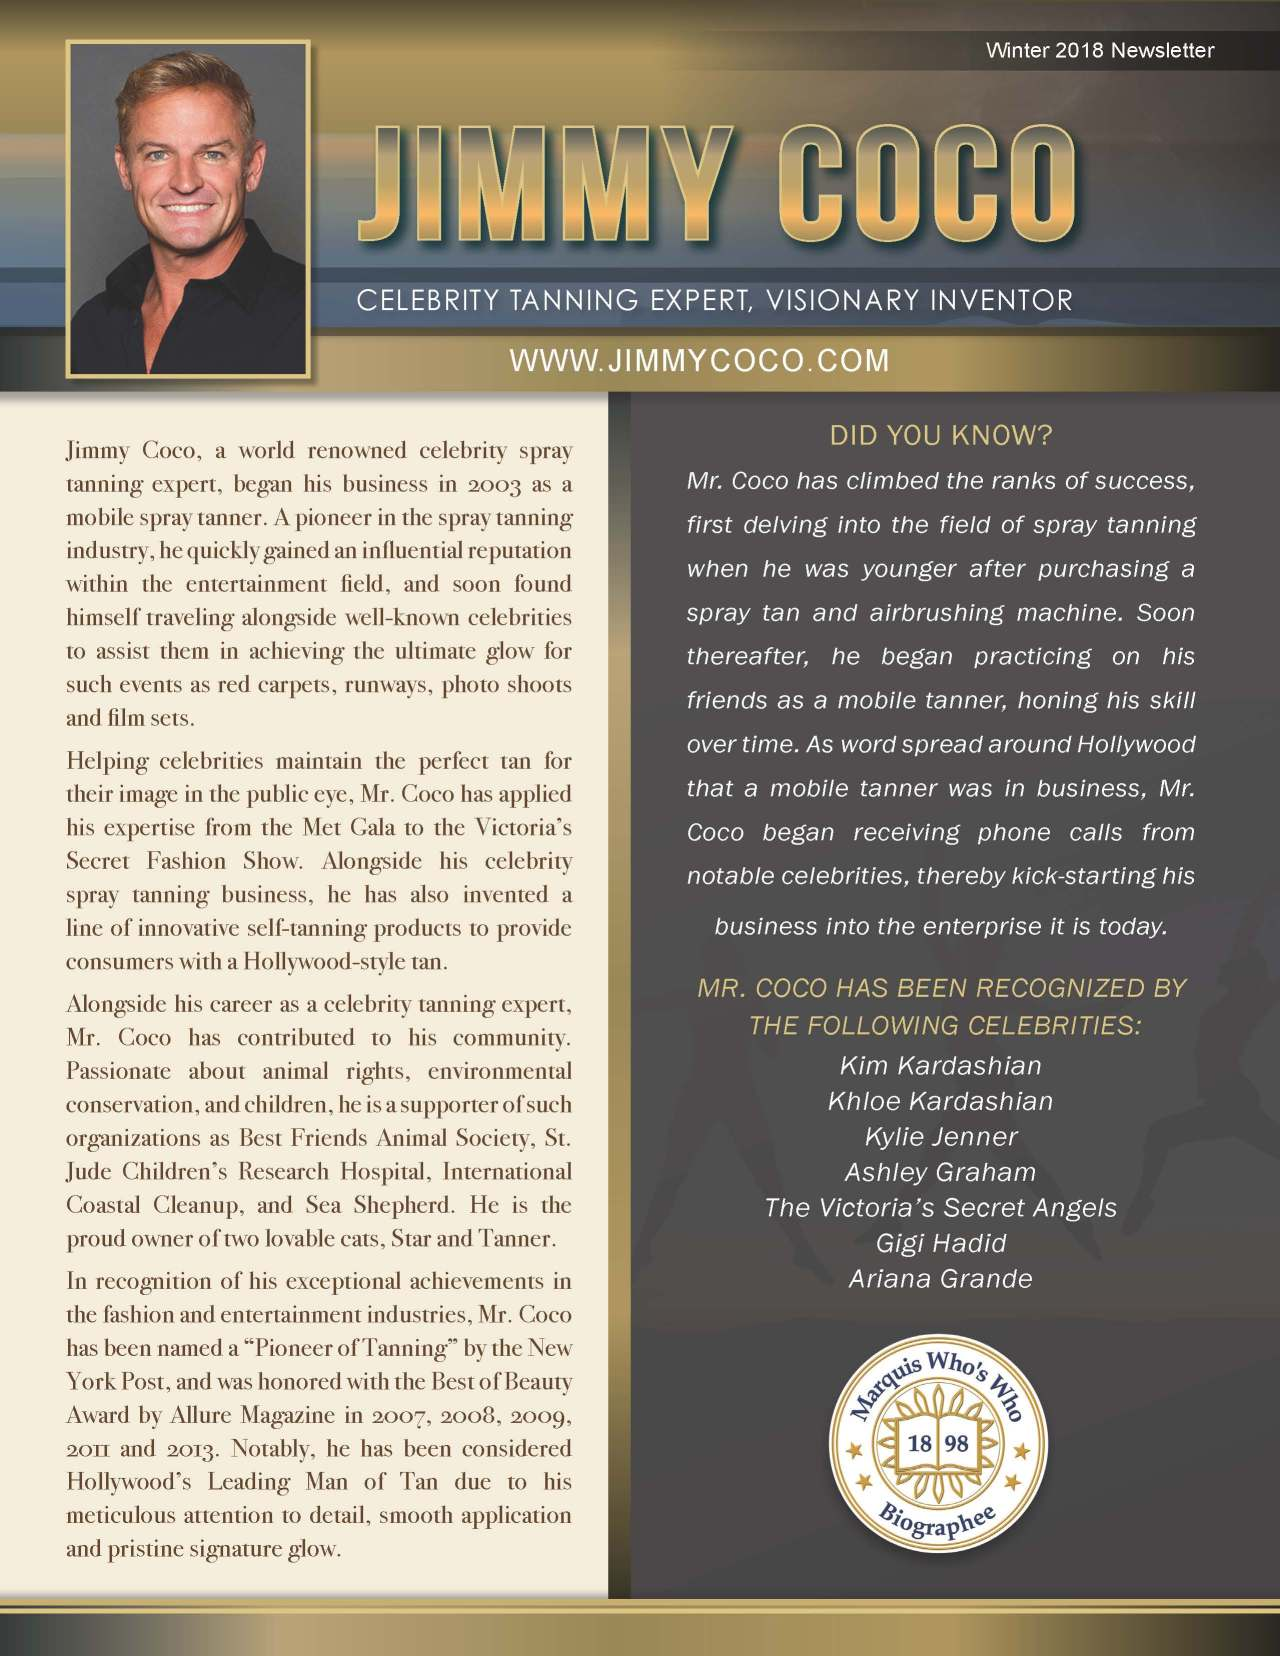 Snyder, James 3710760_4003710760 Newsletter.jpg